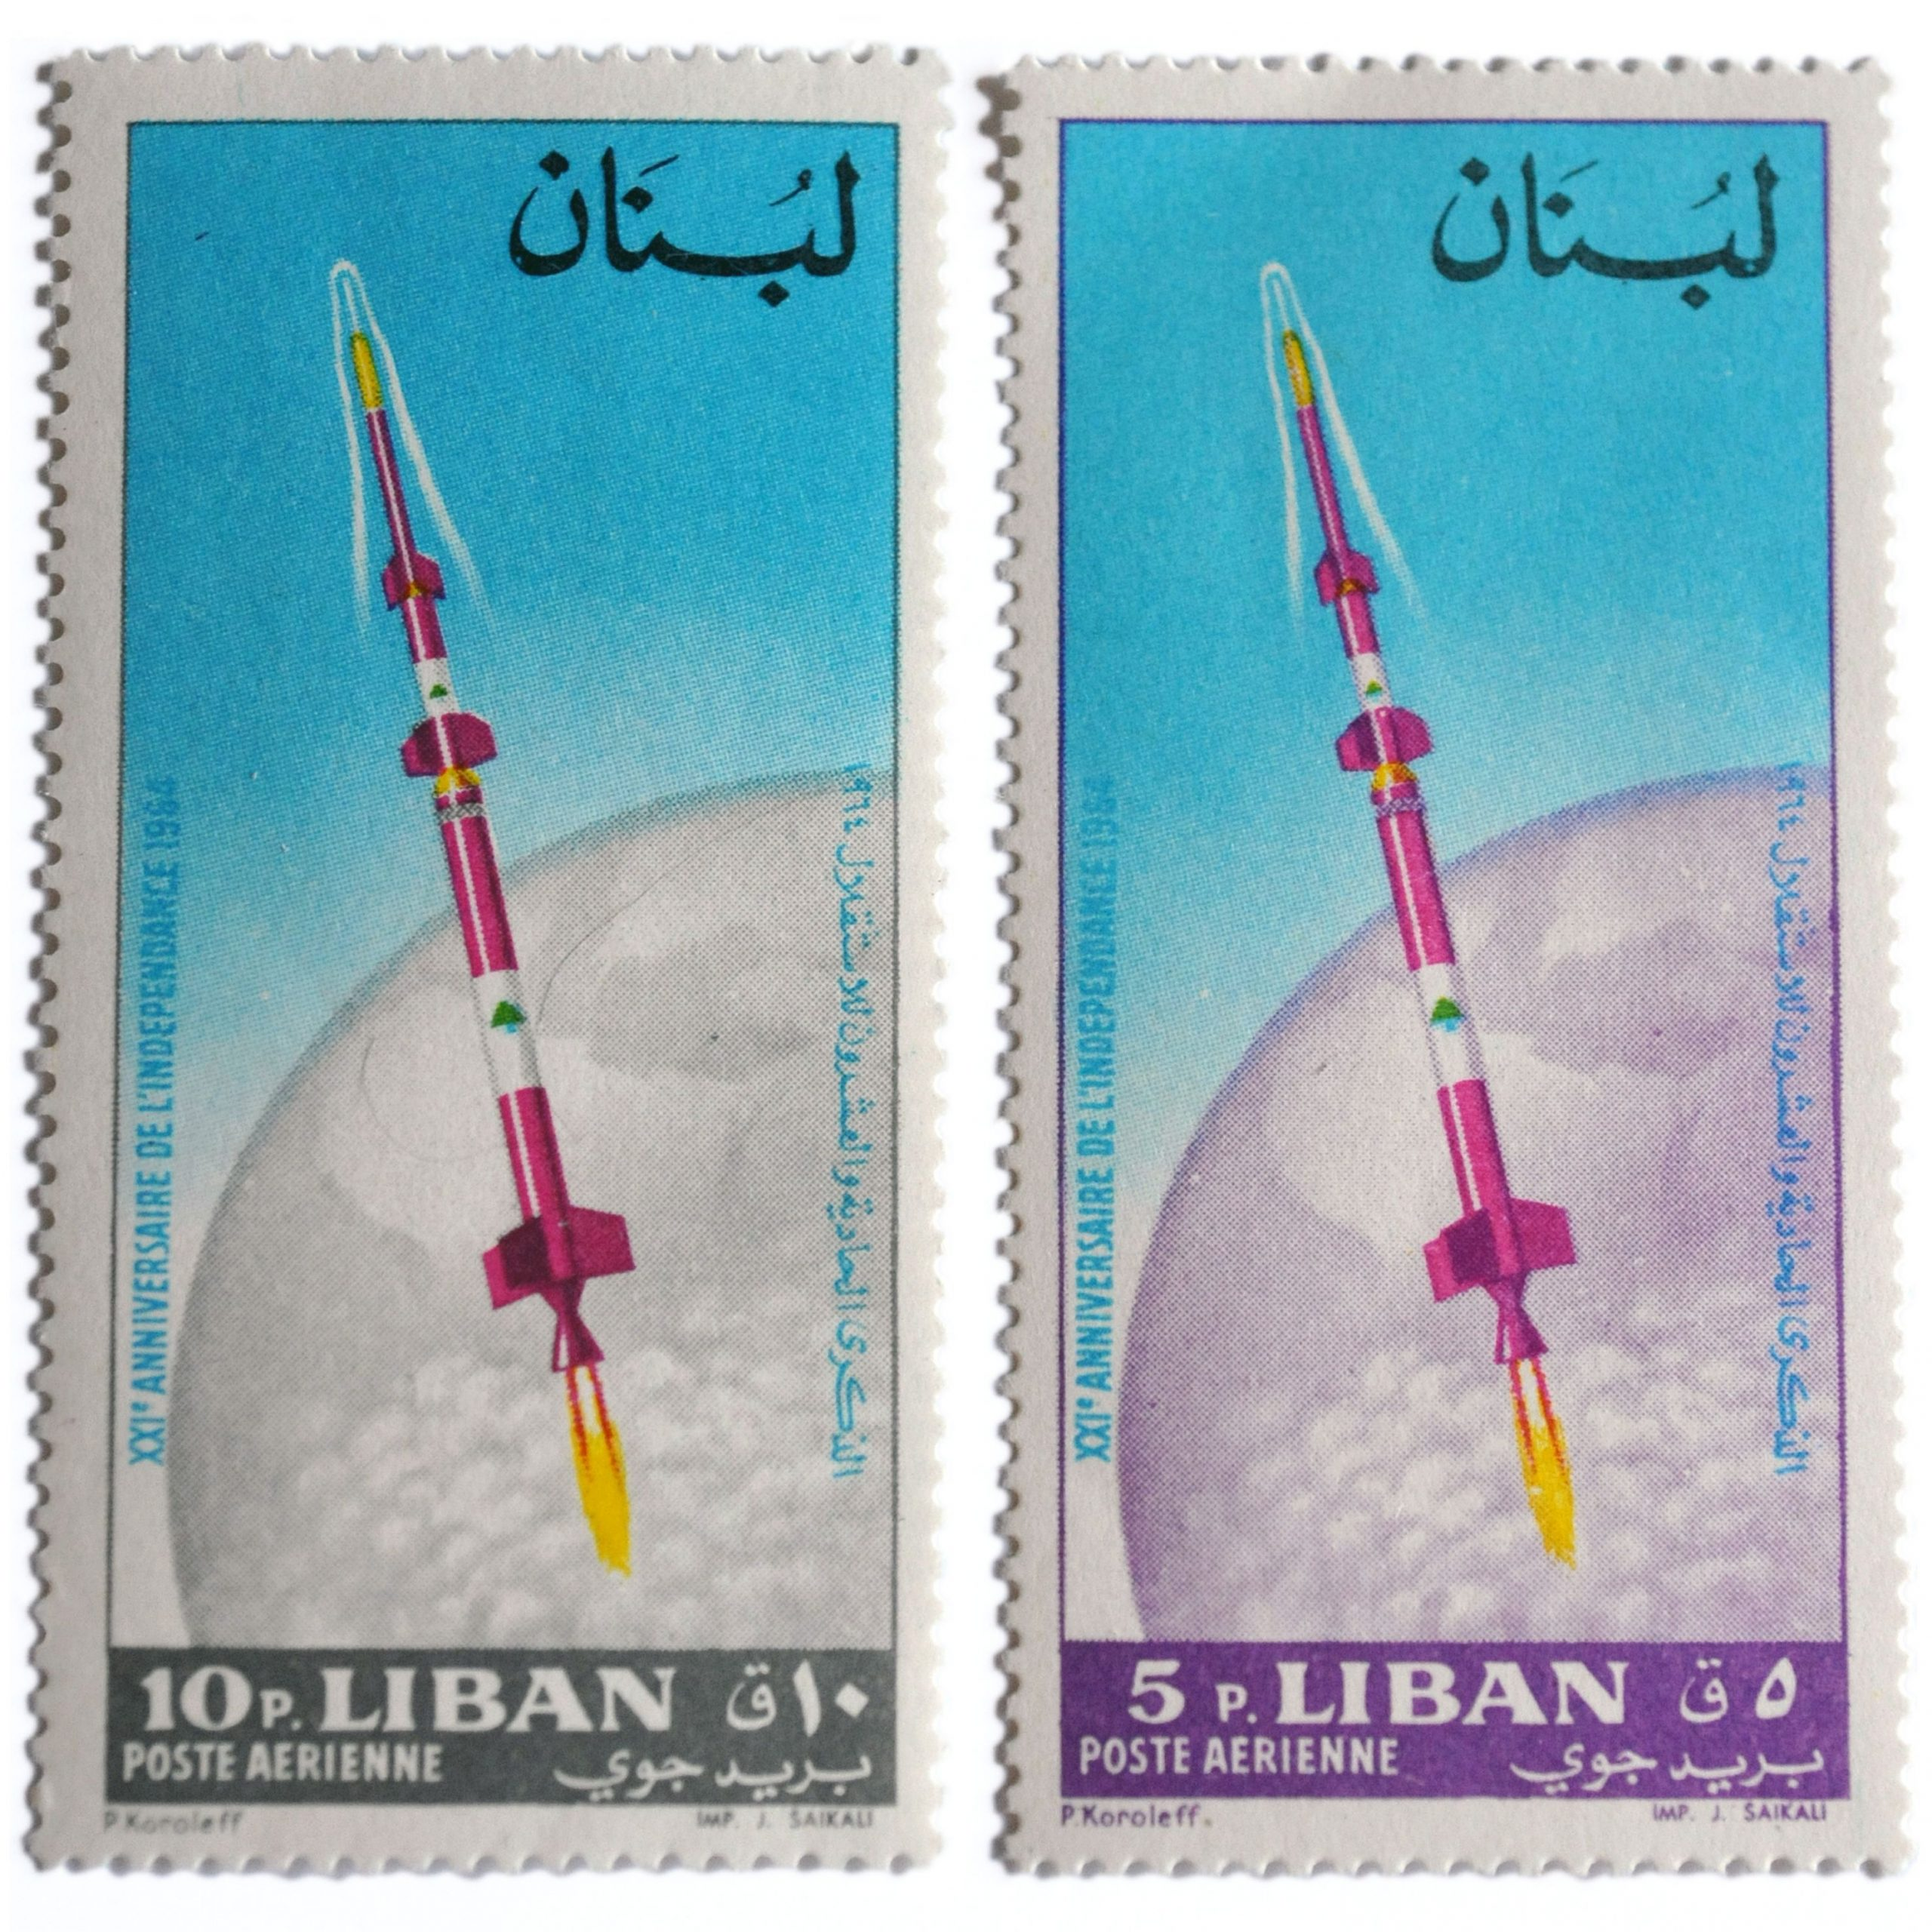 Lebanese Rocket Society, Joana Hadjithomas and Khalil Joreige, 2013